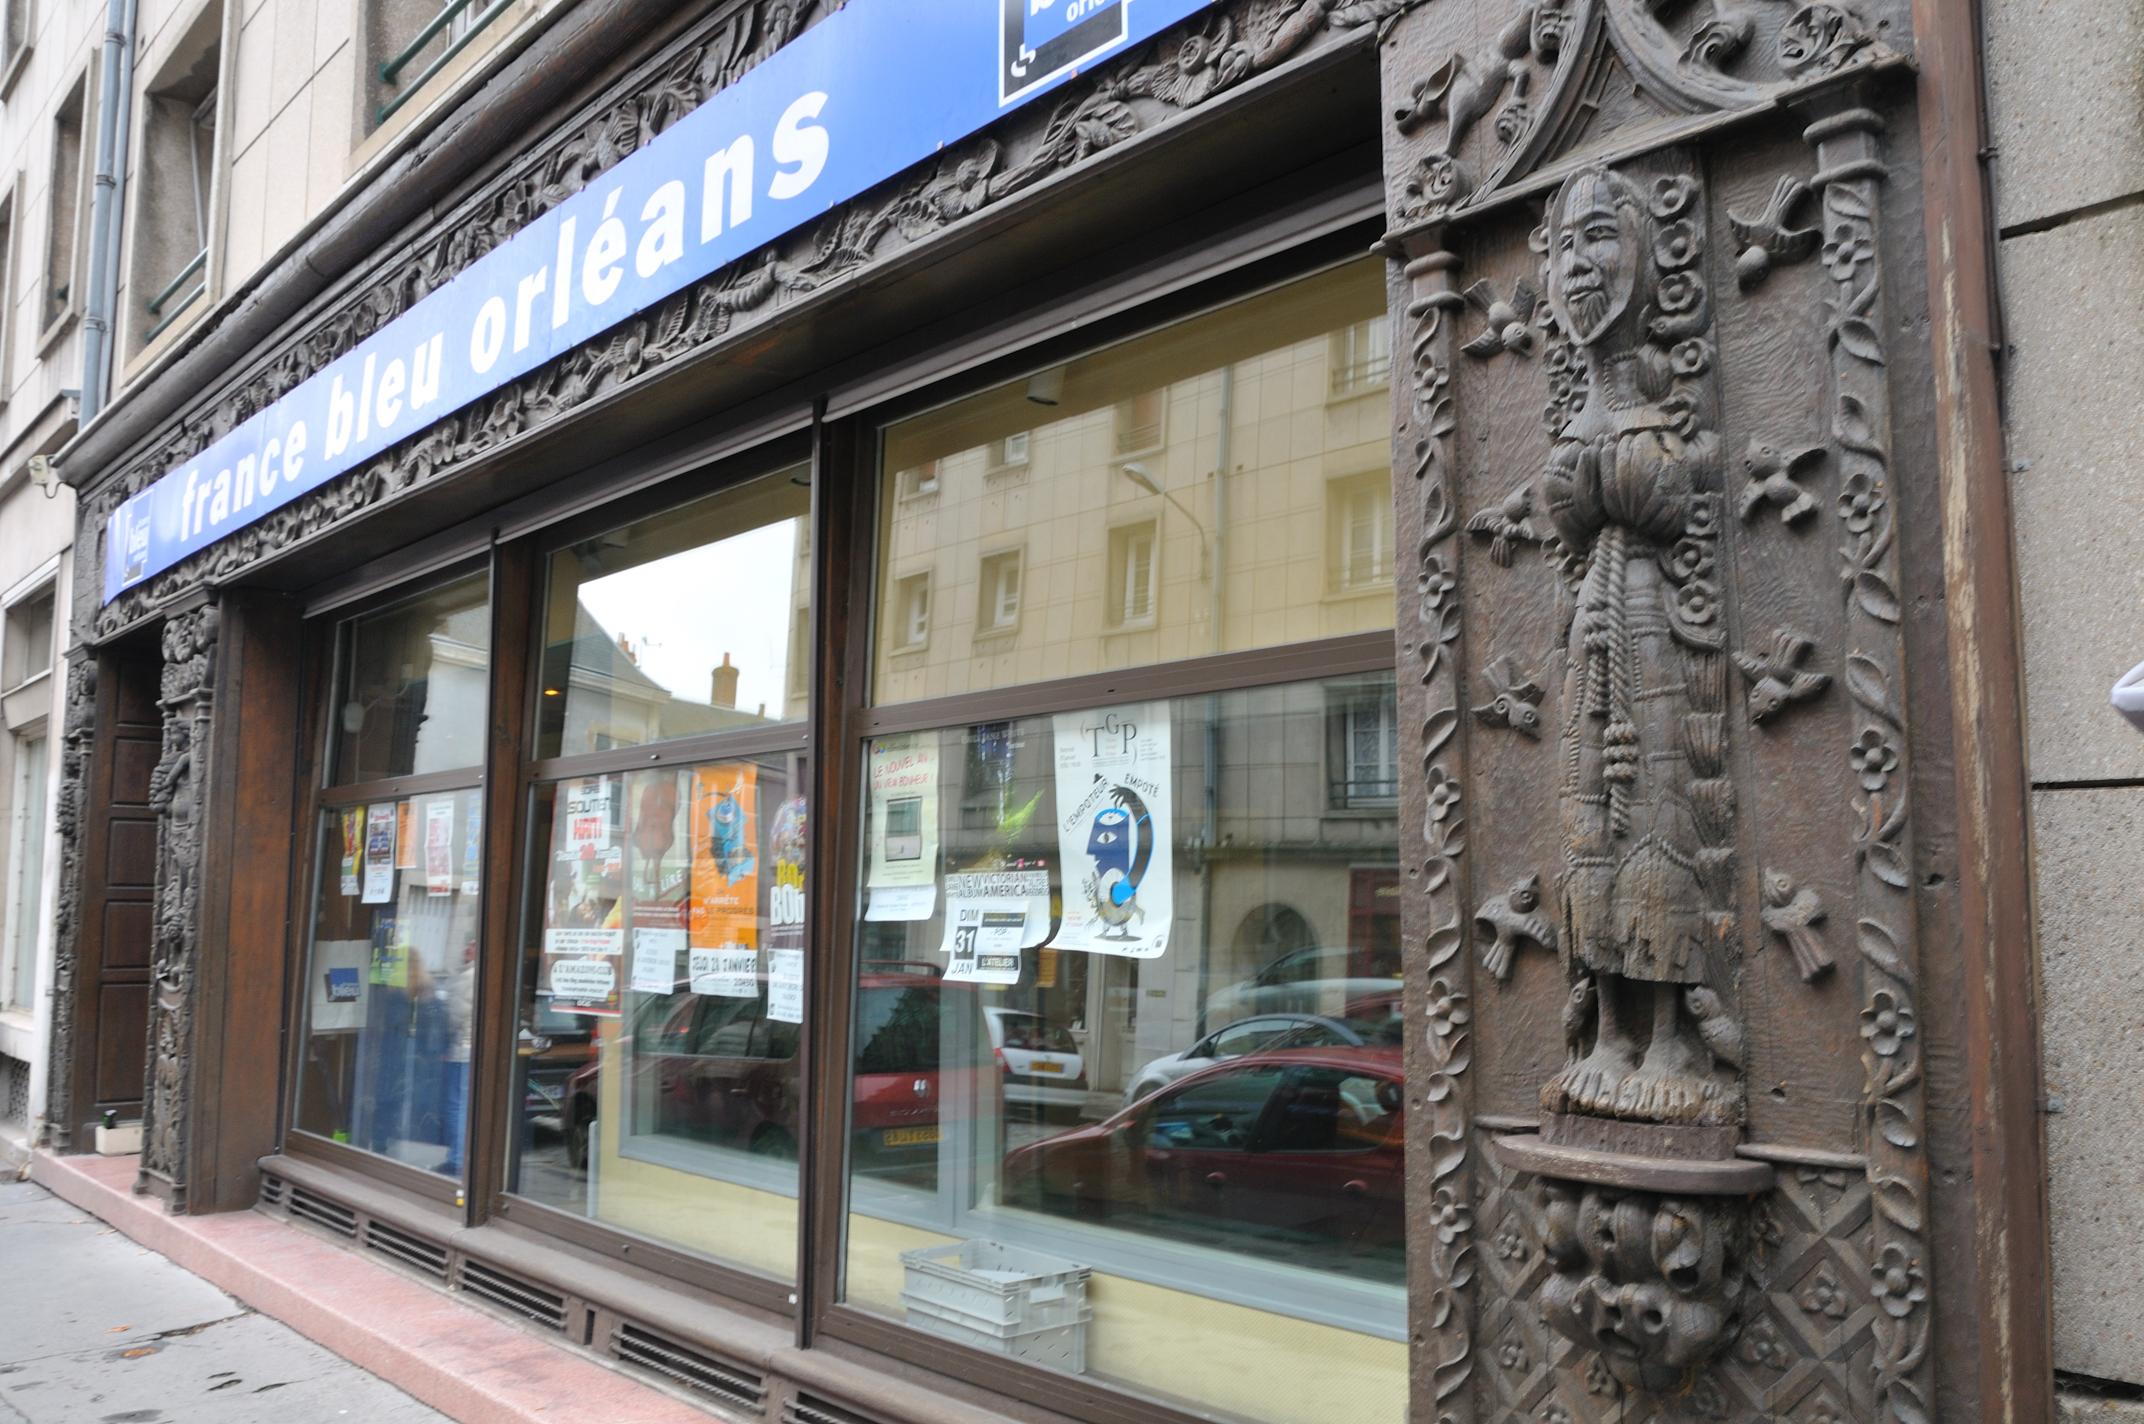 France bleu orl ans wikiwand - France bleu orleans cuisine ...